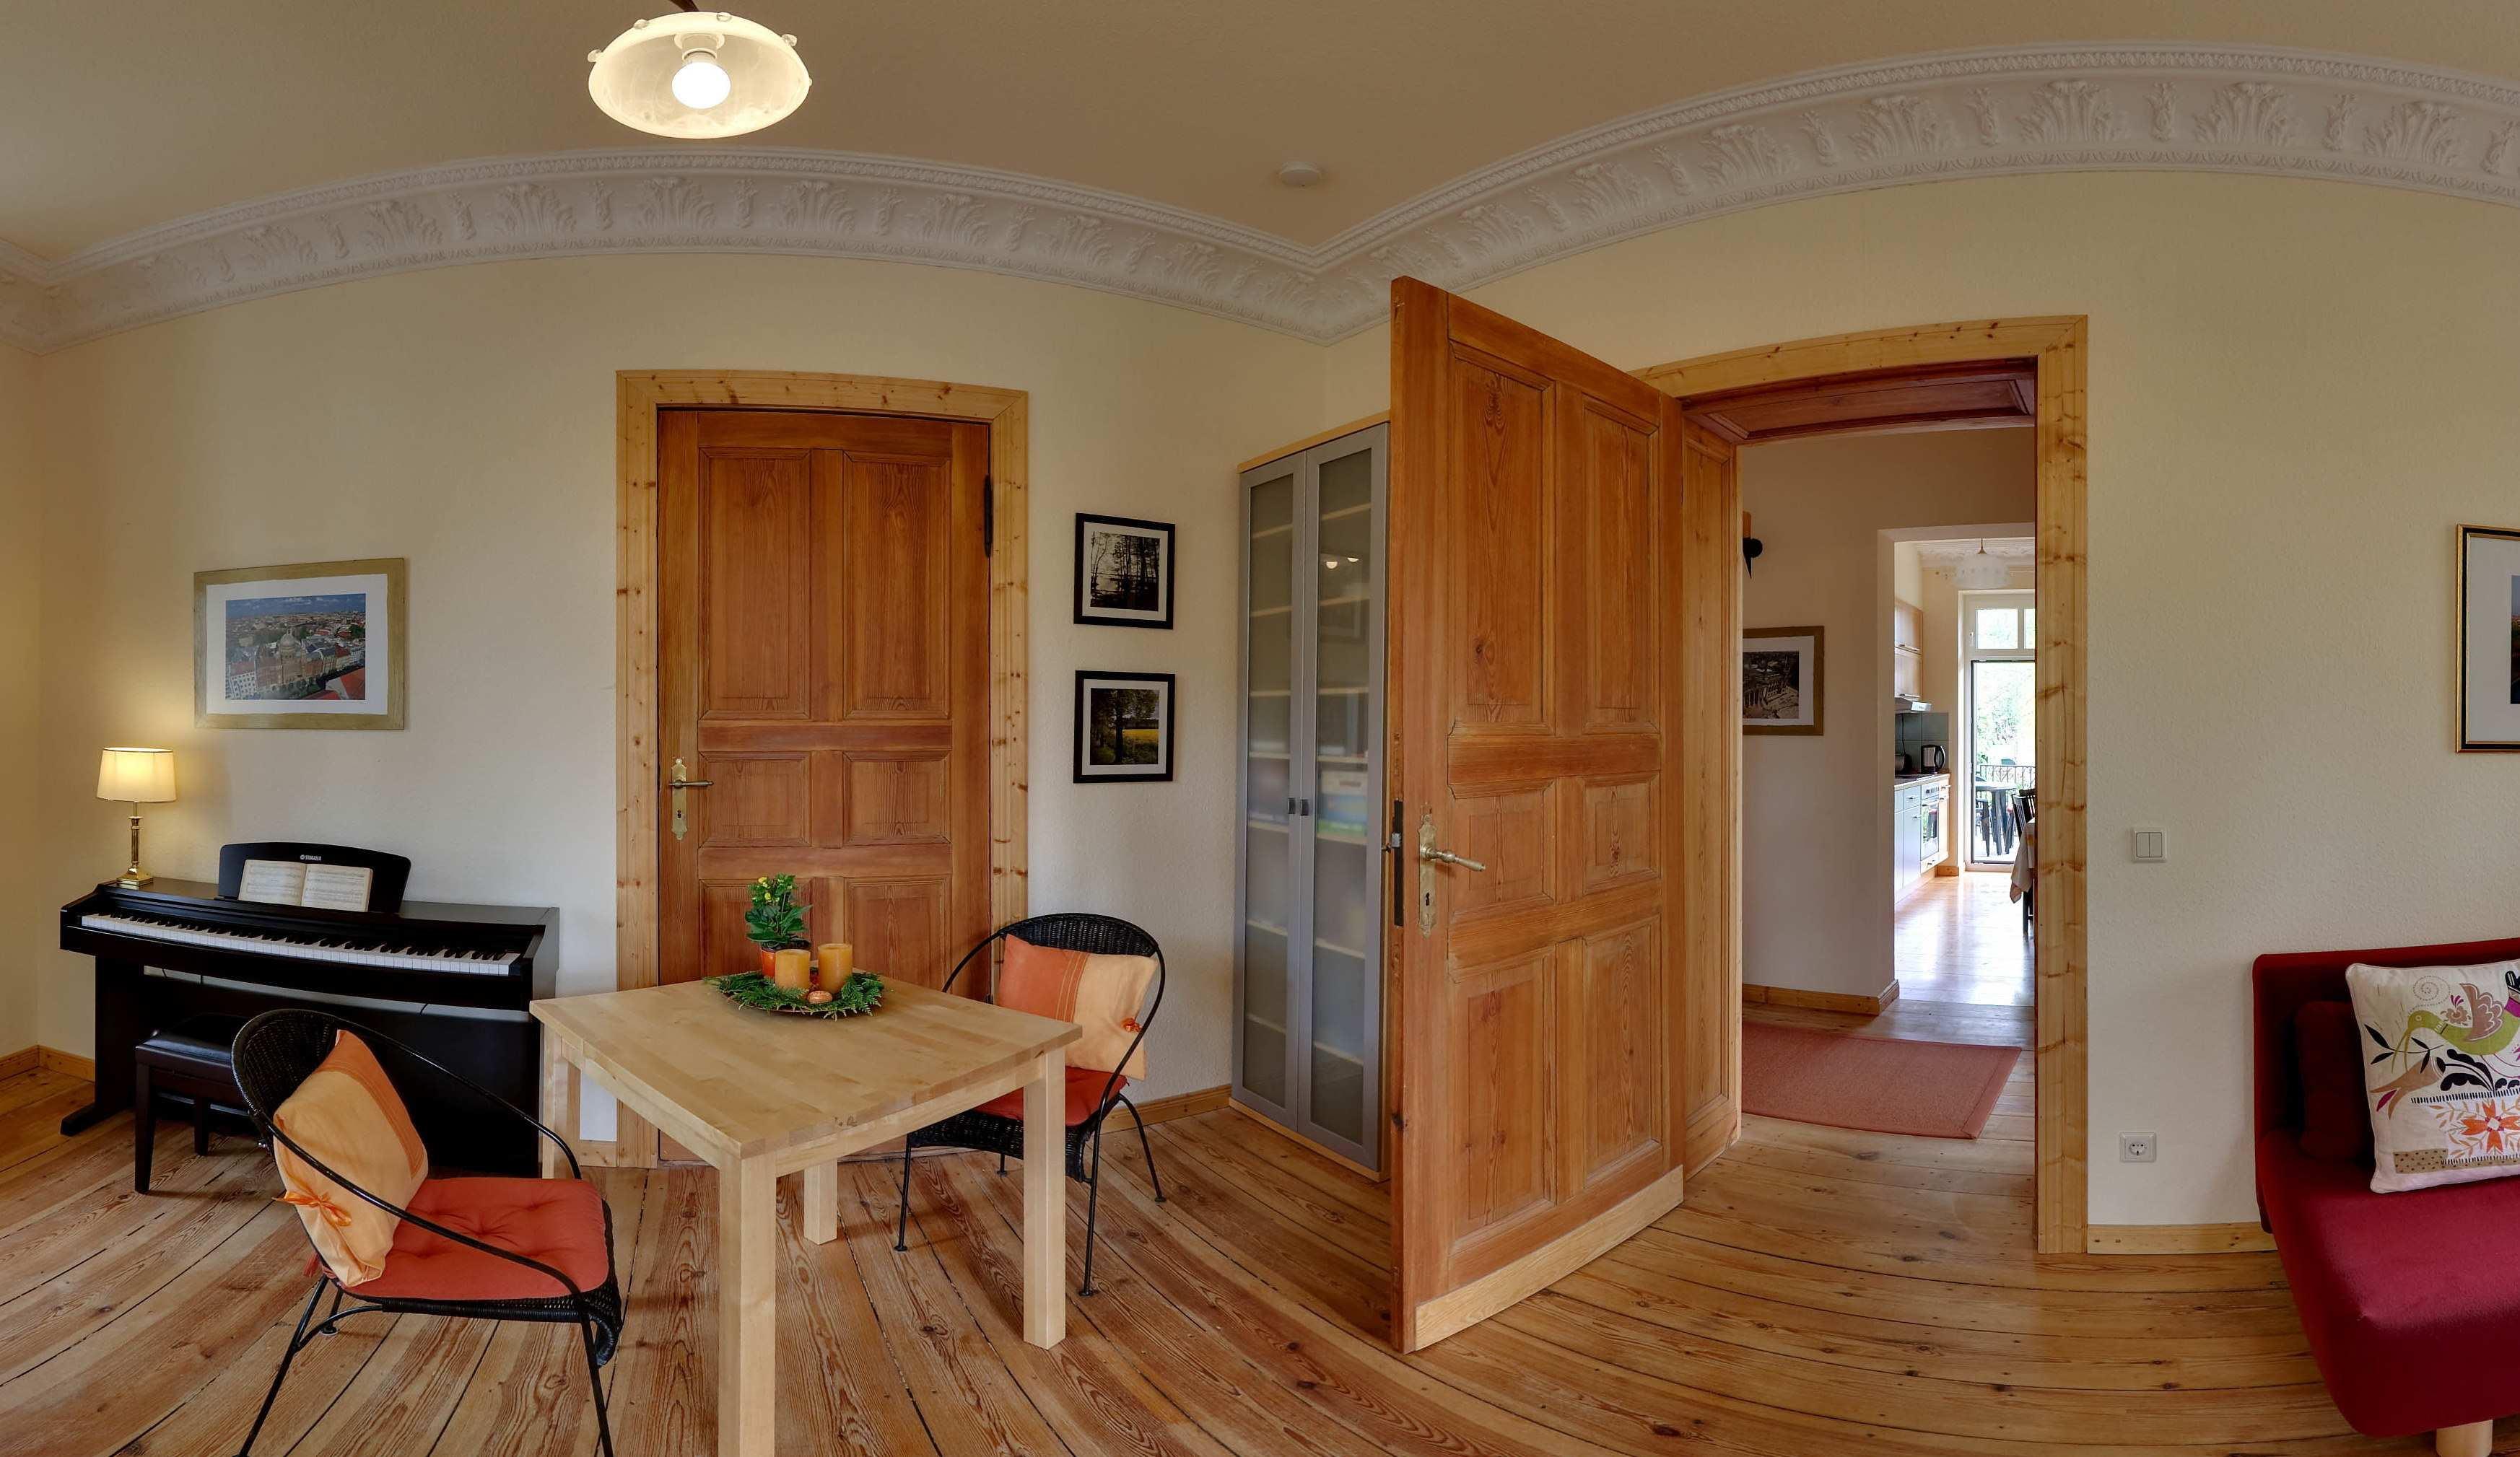 Villa seepark vacation apartment berlin germany eco for Warmer bodenbelag wohnzimmer